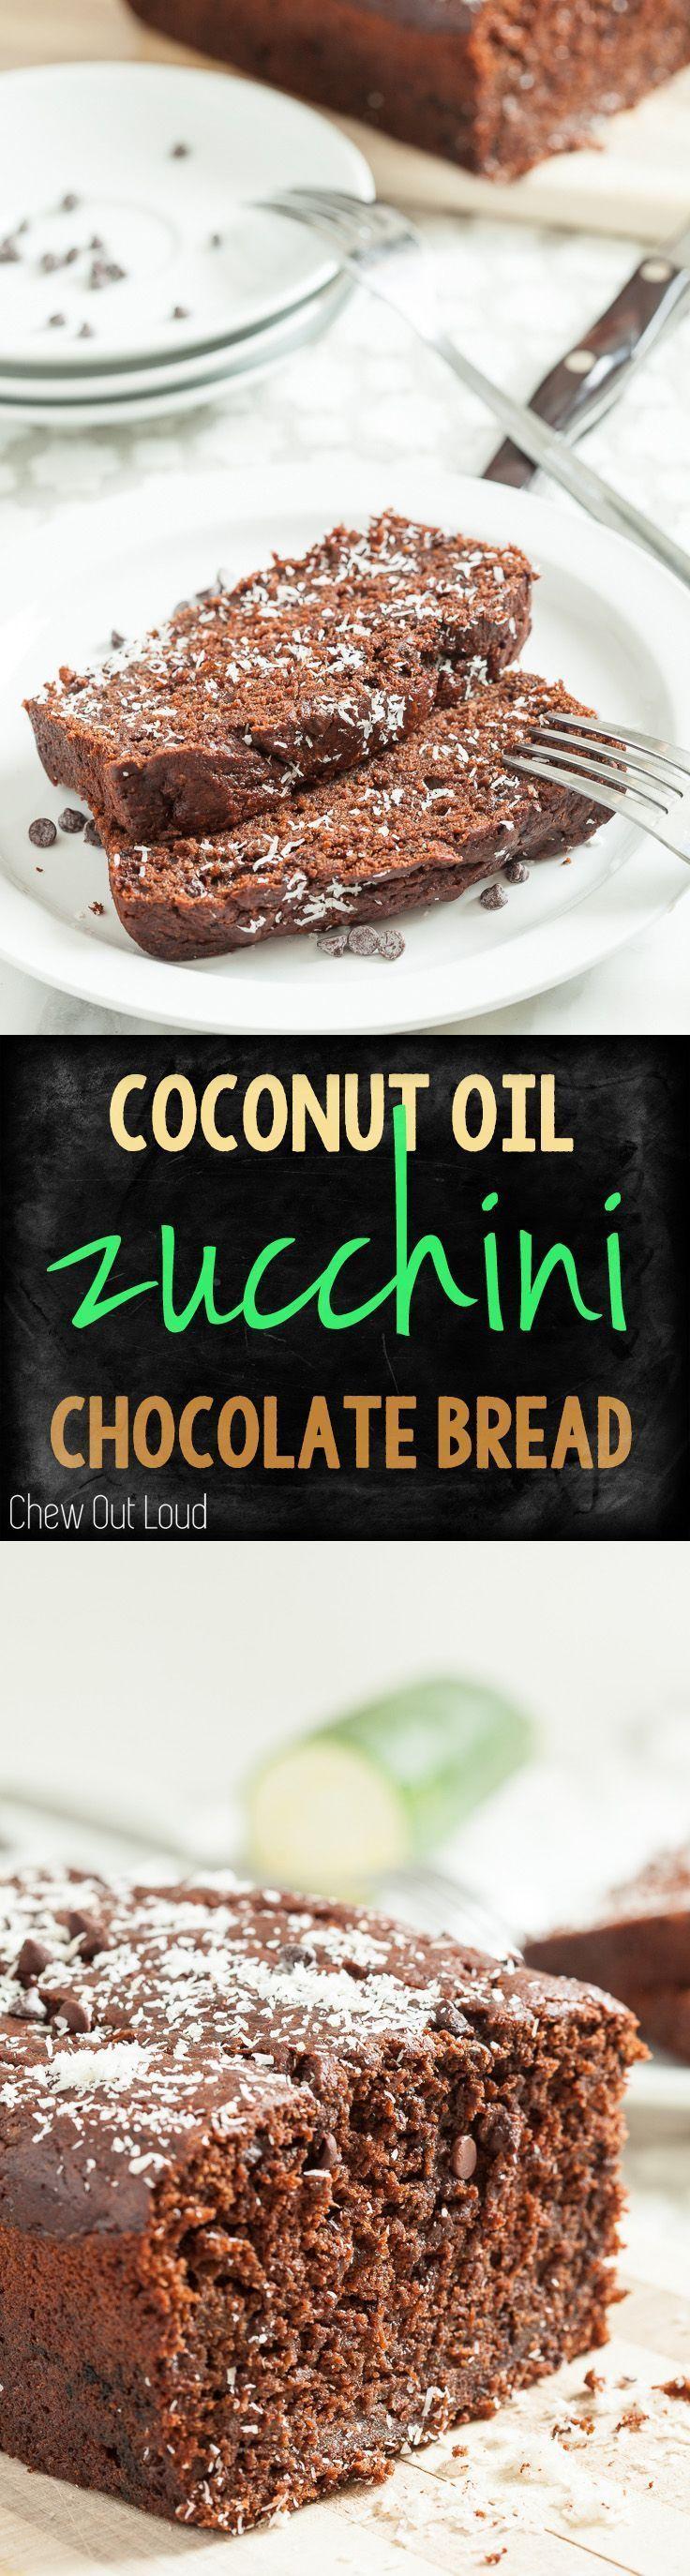 Chocolate zucchini coconut oil bread chew out loud